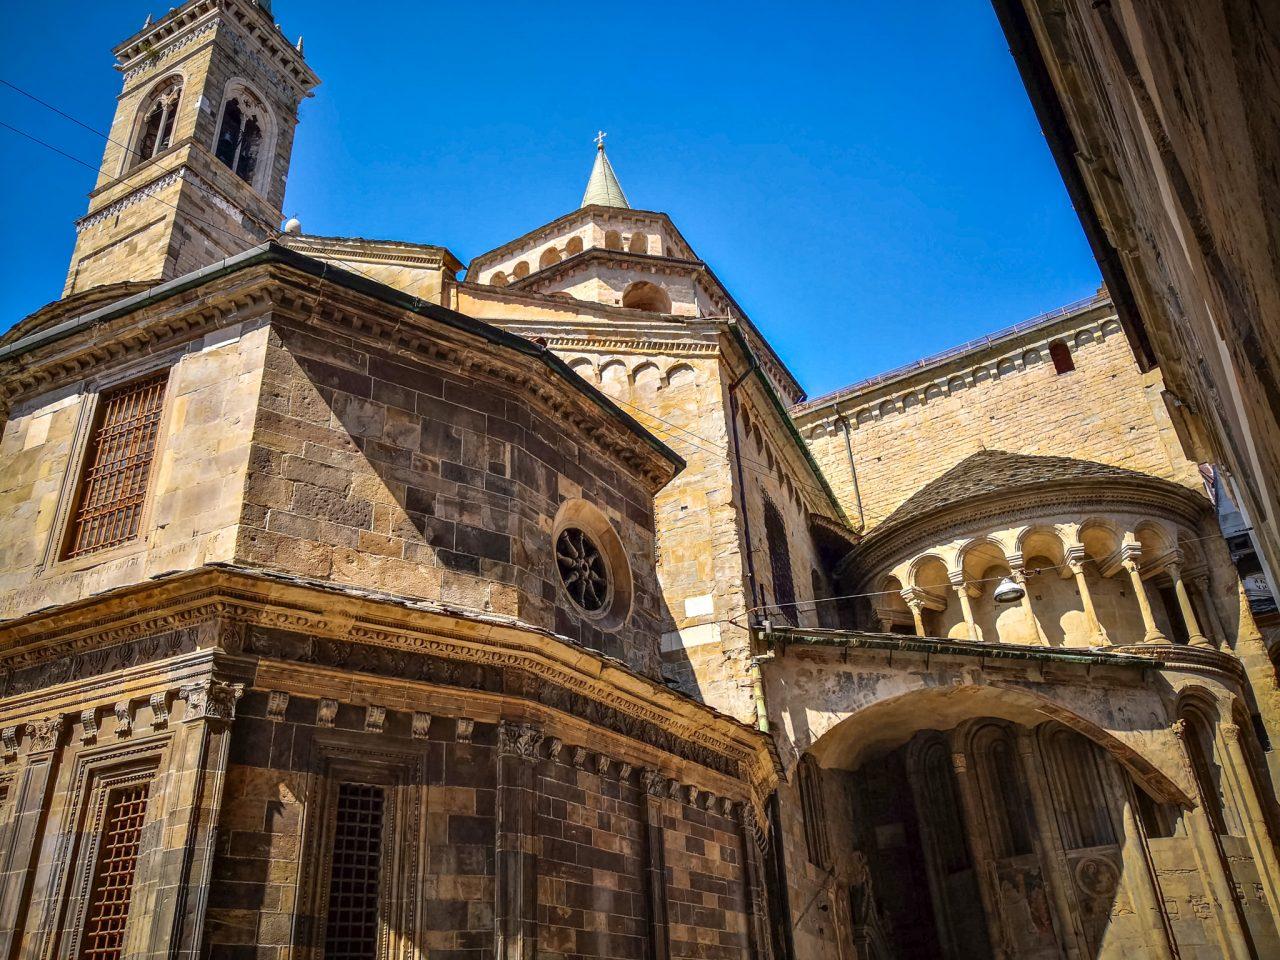 Базилика Санта-Мария-Маджоре (Basilica di Santa Maria Maggiore)